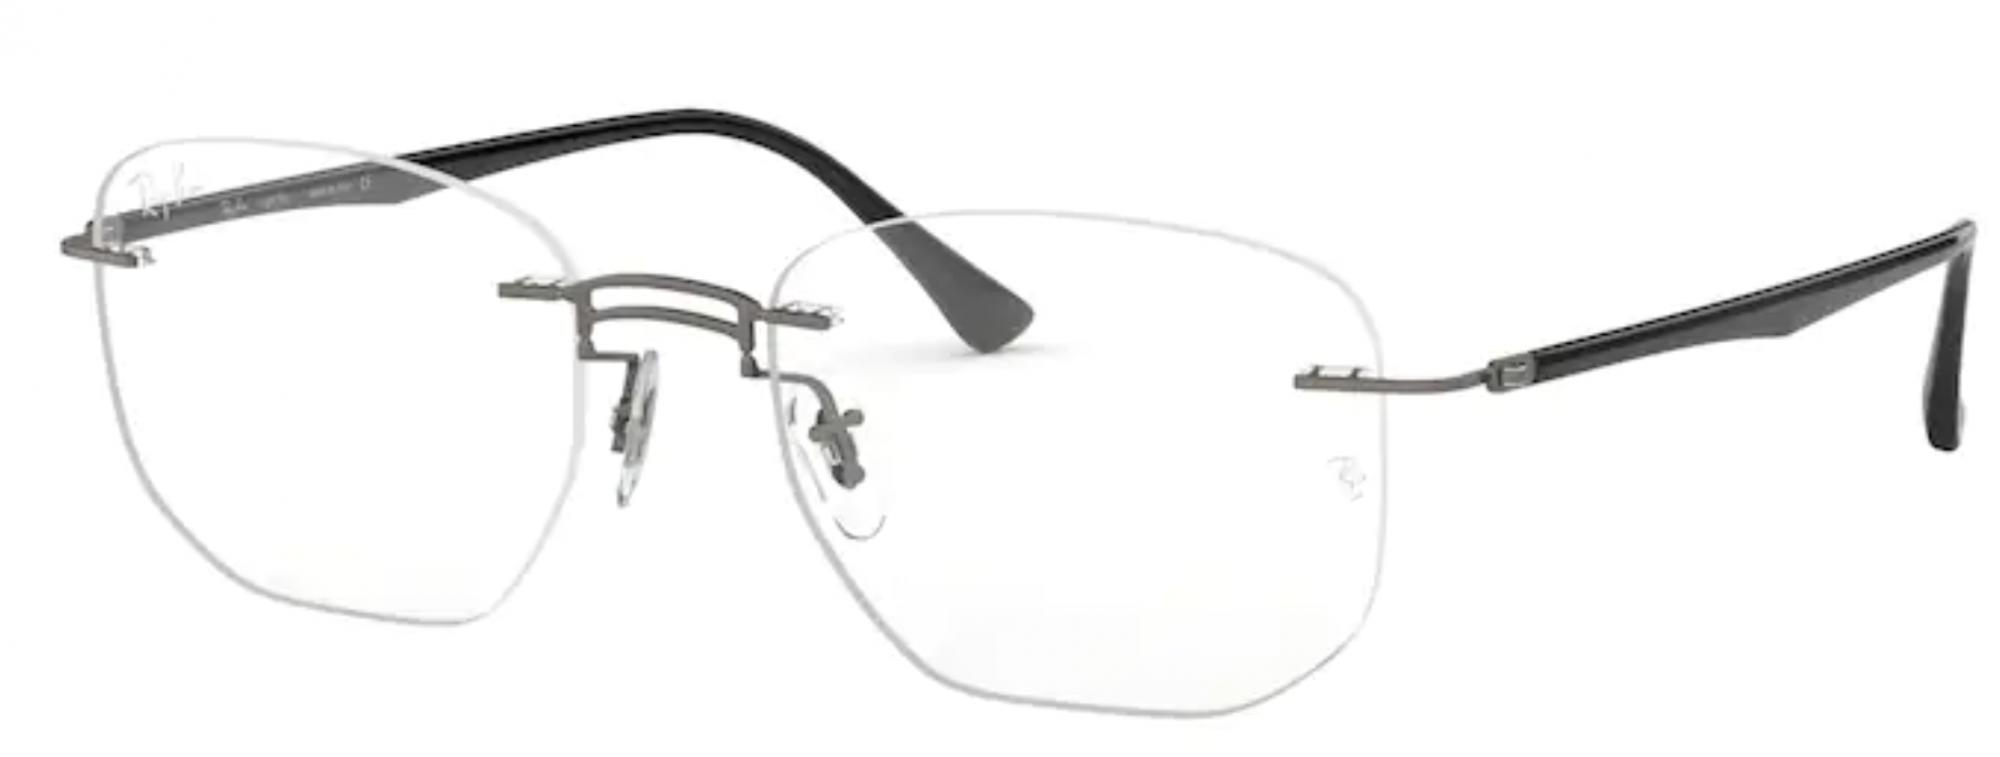 Óculos de Grau Ray Ban Sem Aro LightRay RB8757 1128 Tam. 53